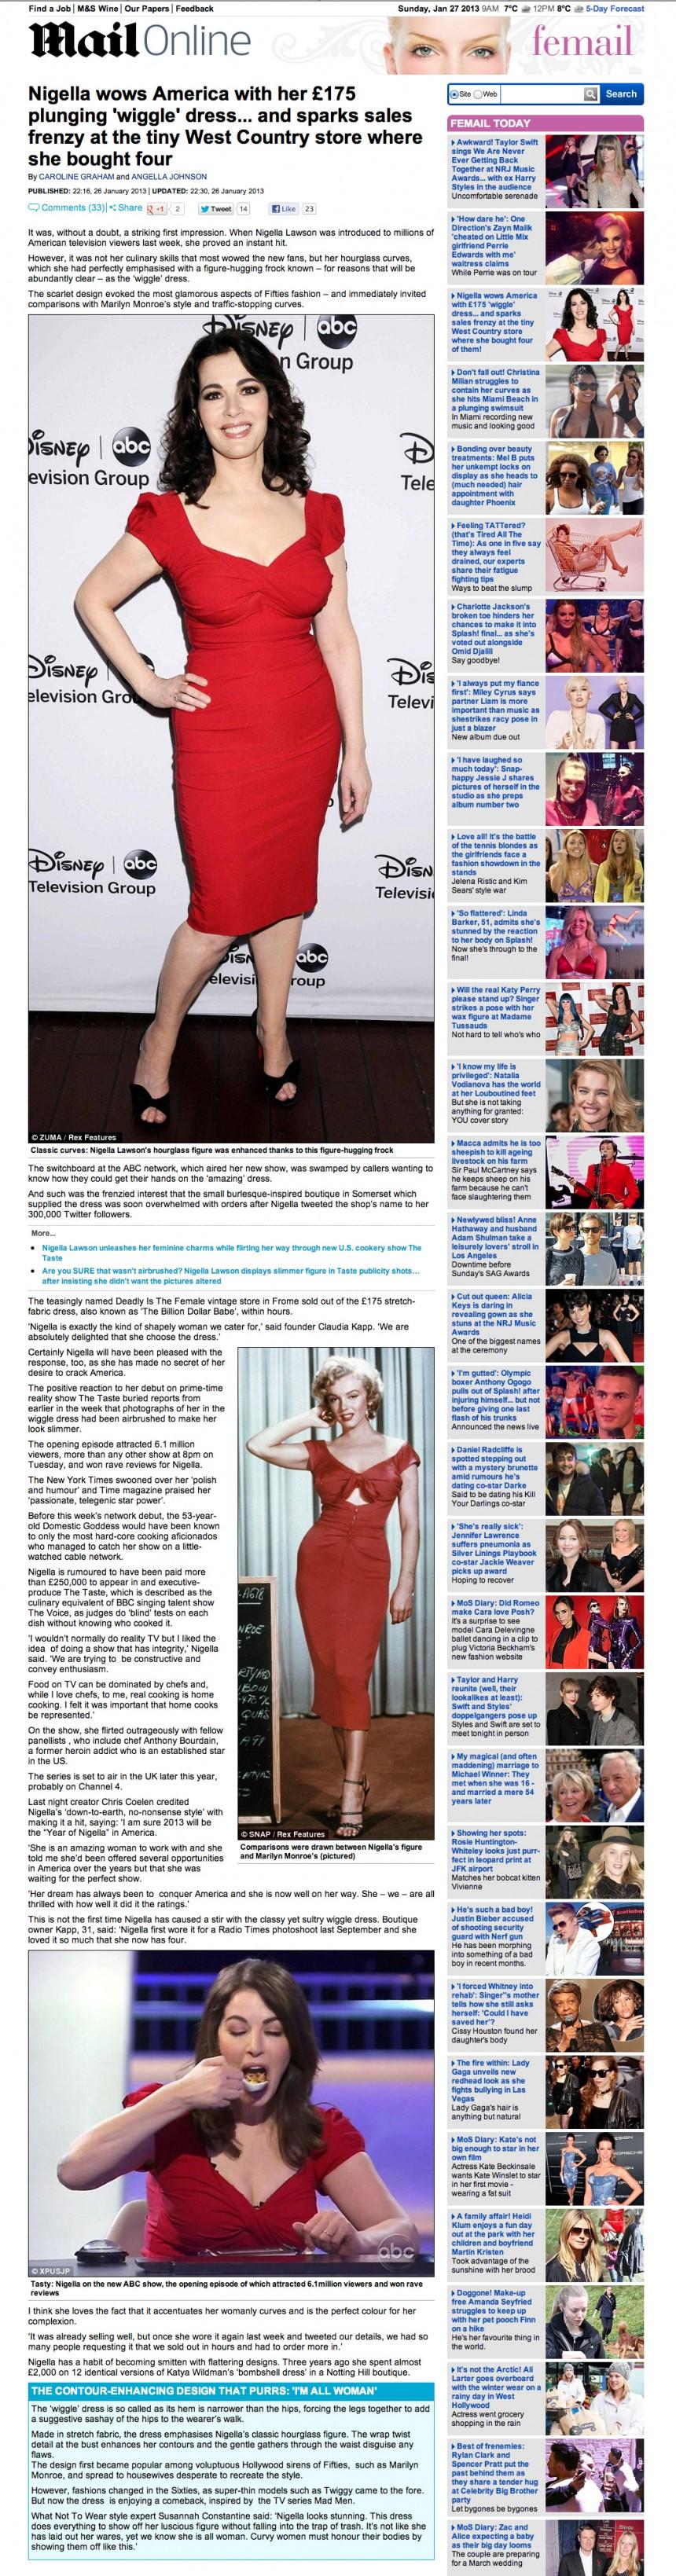 Nigella_Red_Wiggle_Dress_Mail_Online